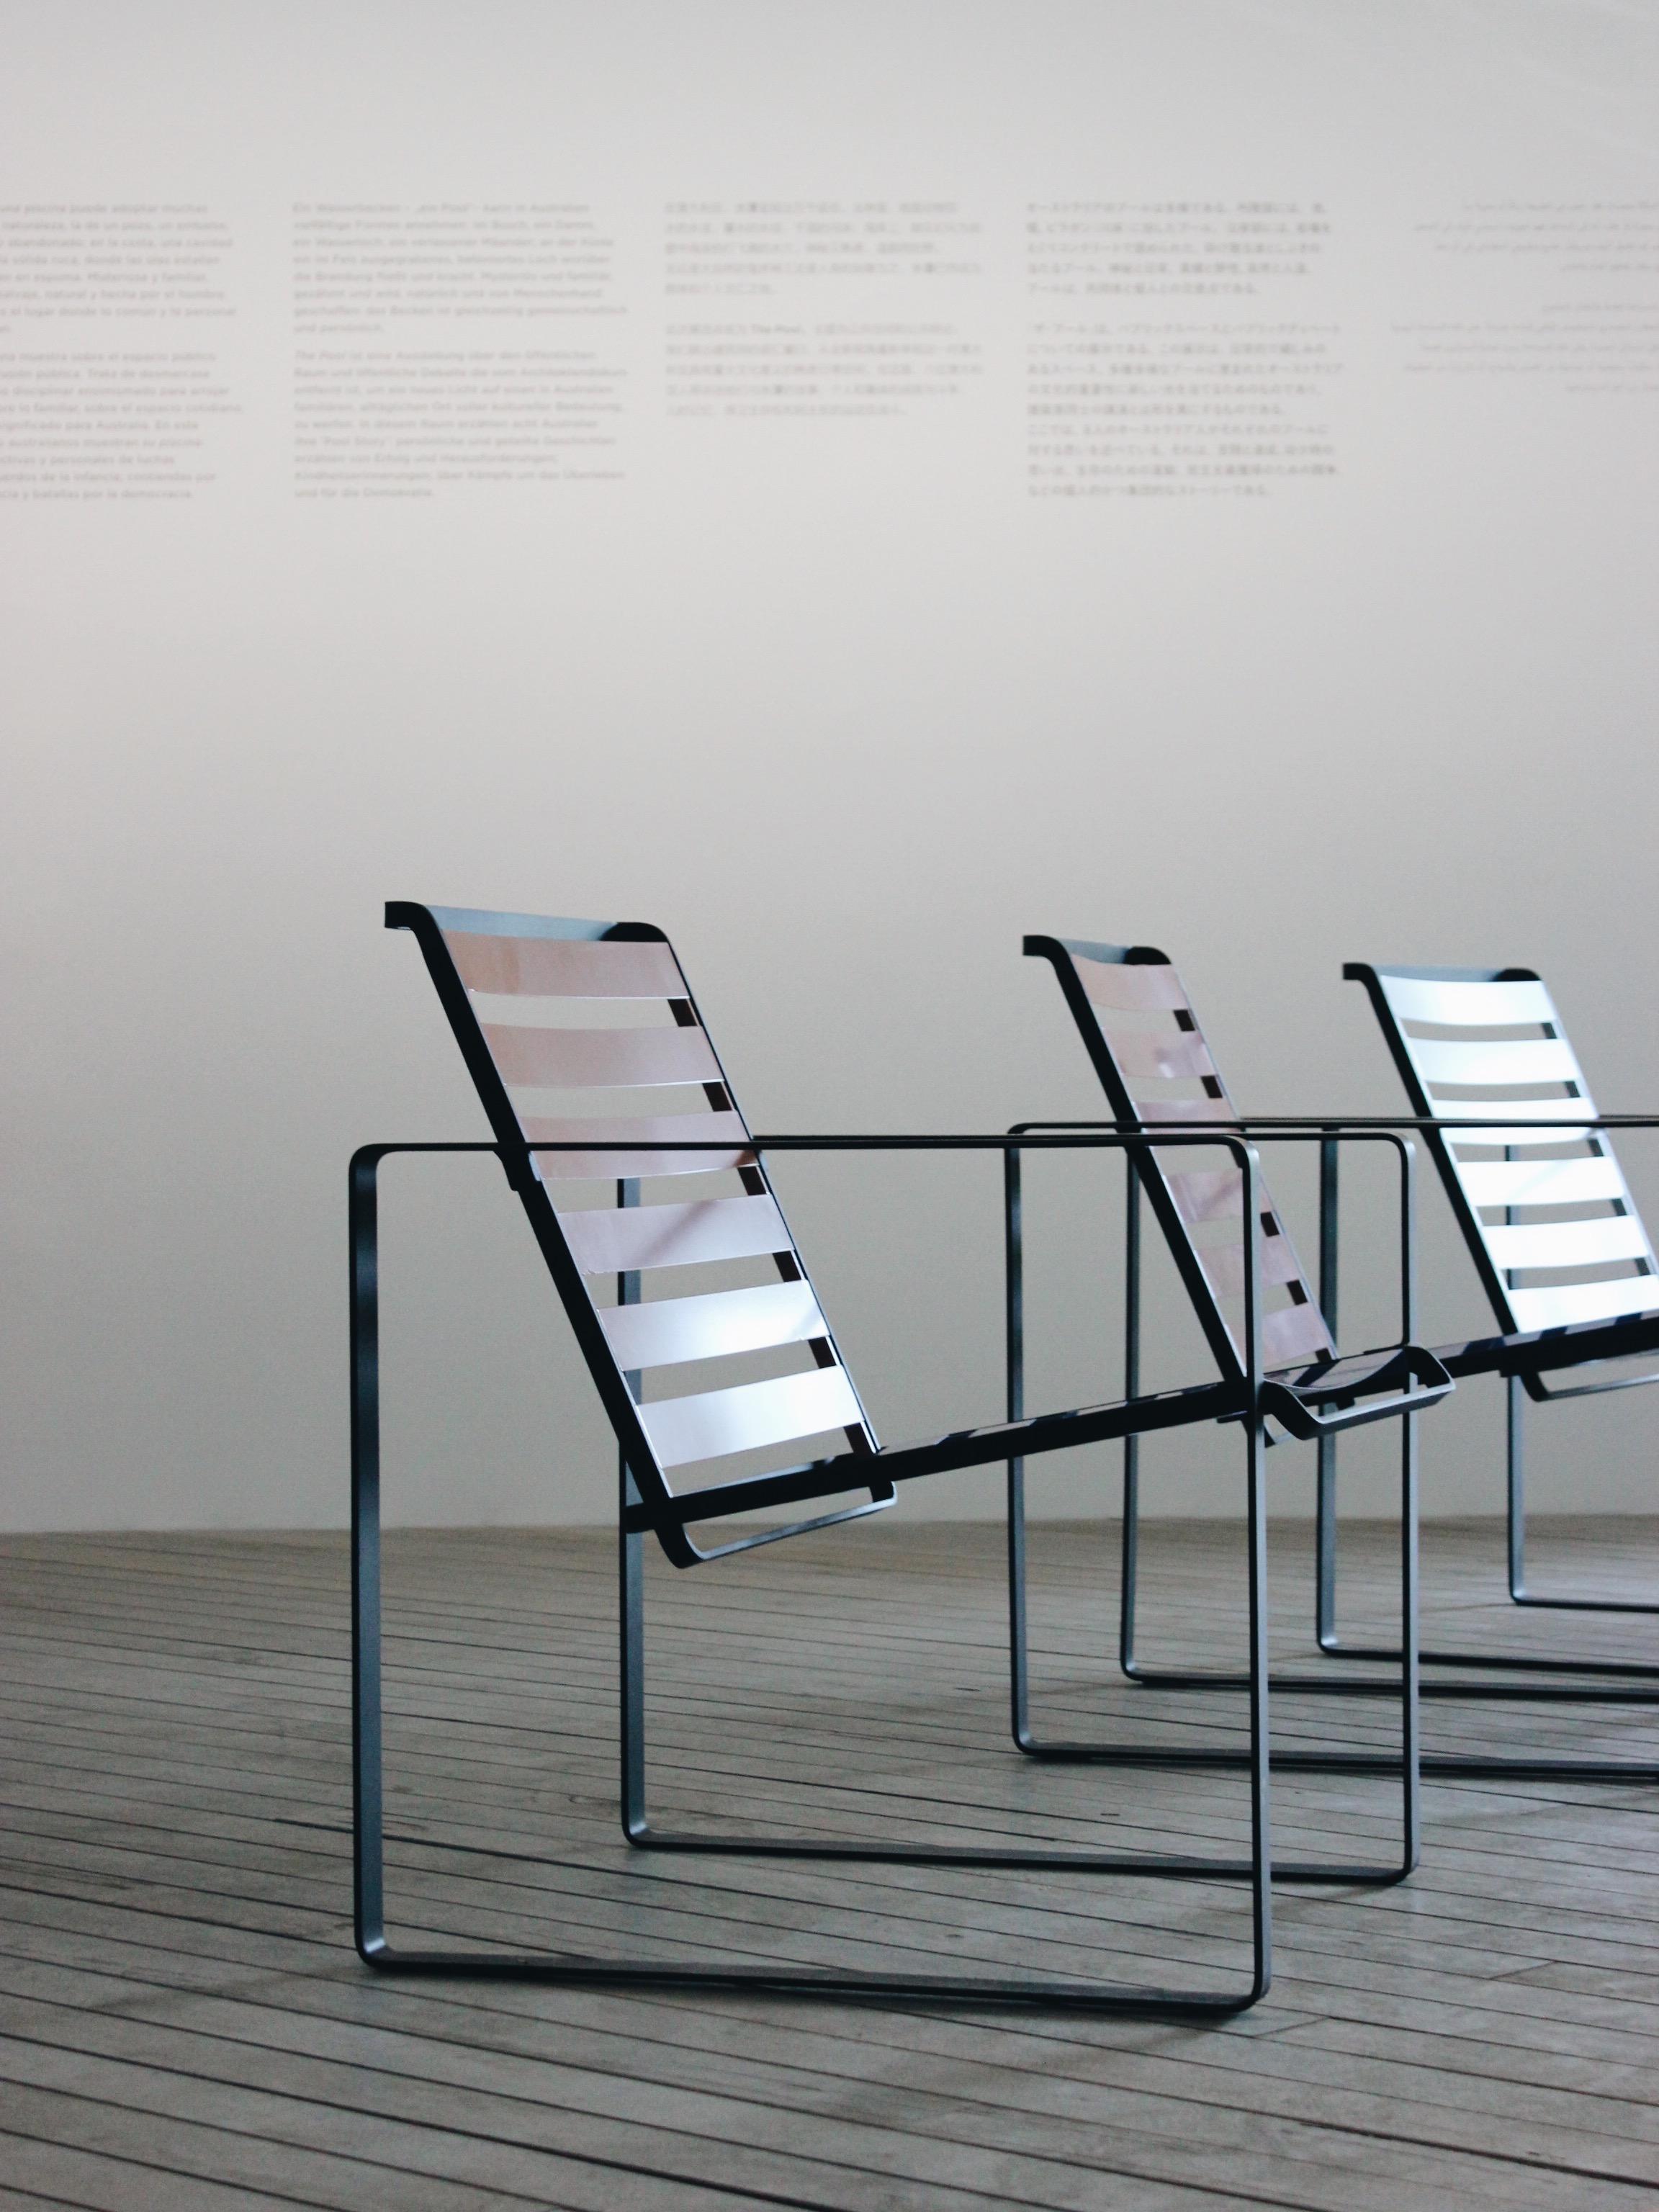 Anerle-aneme Chair_Julia Stockinger.jpg